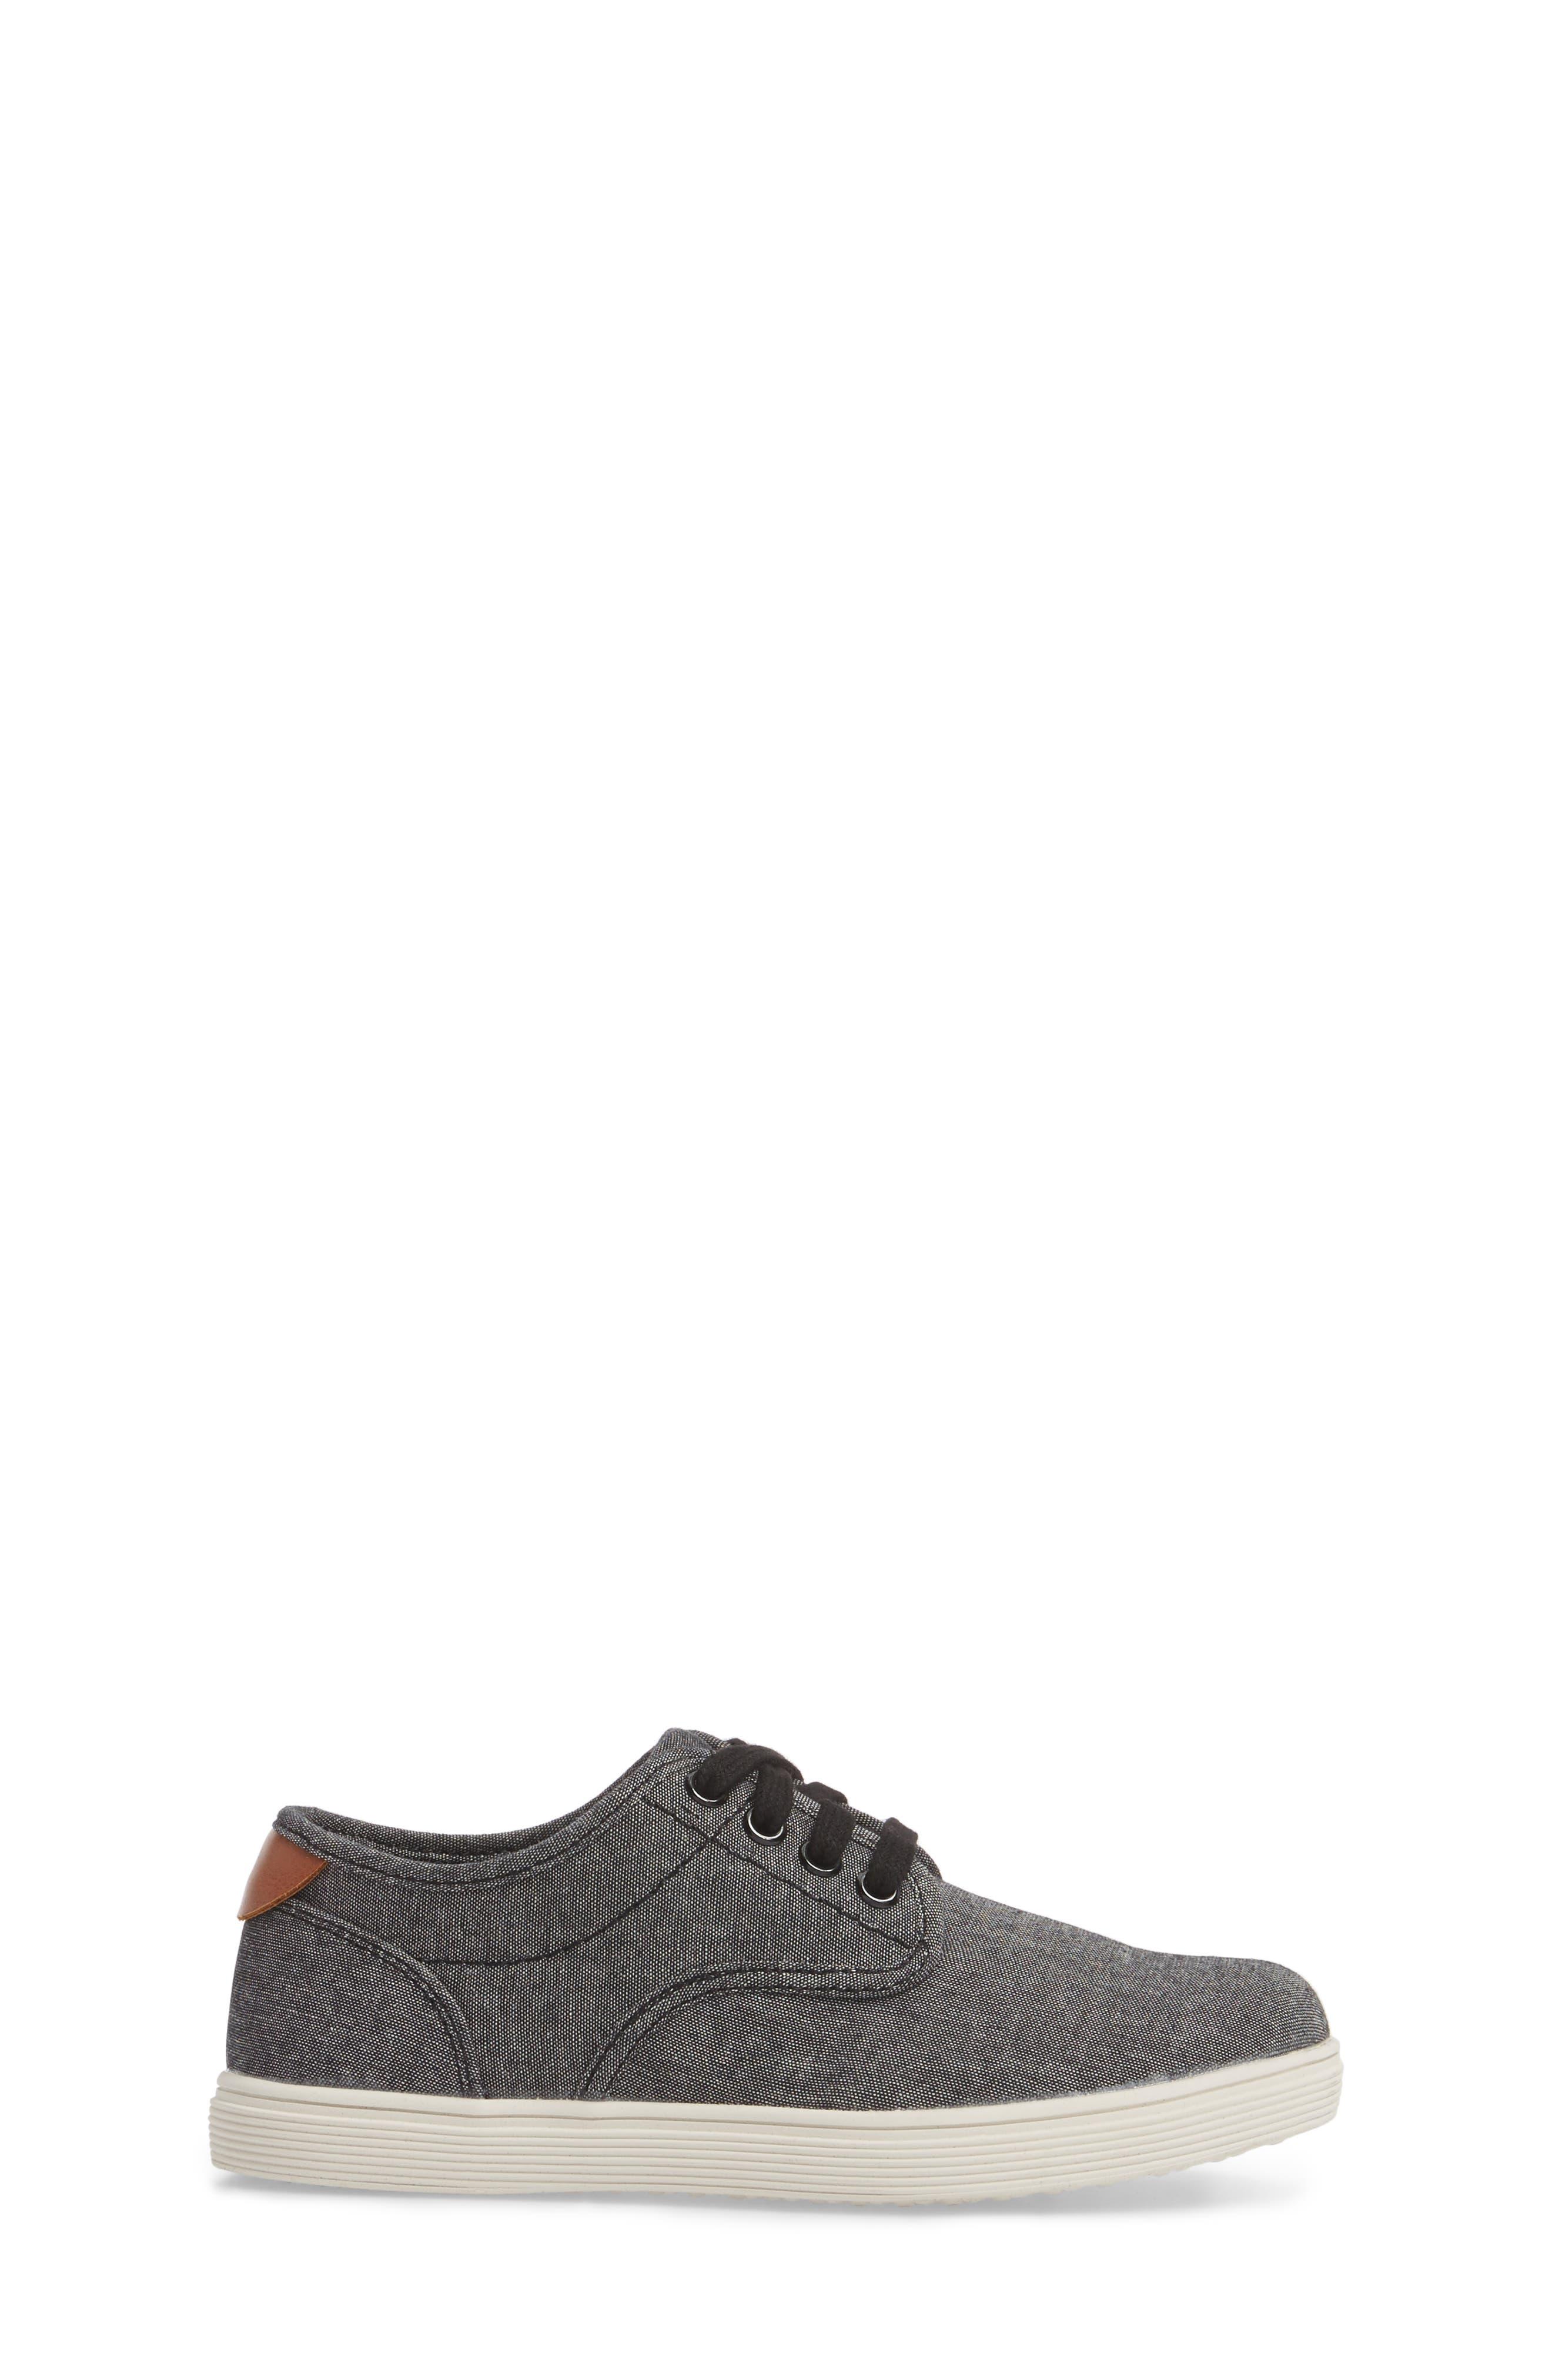 Bfenta Sneaker,                             Alternate thumbnail 3, color,